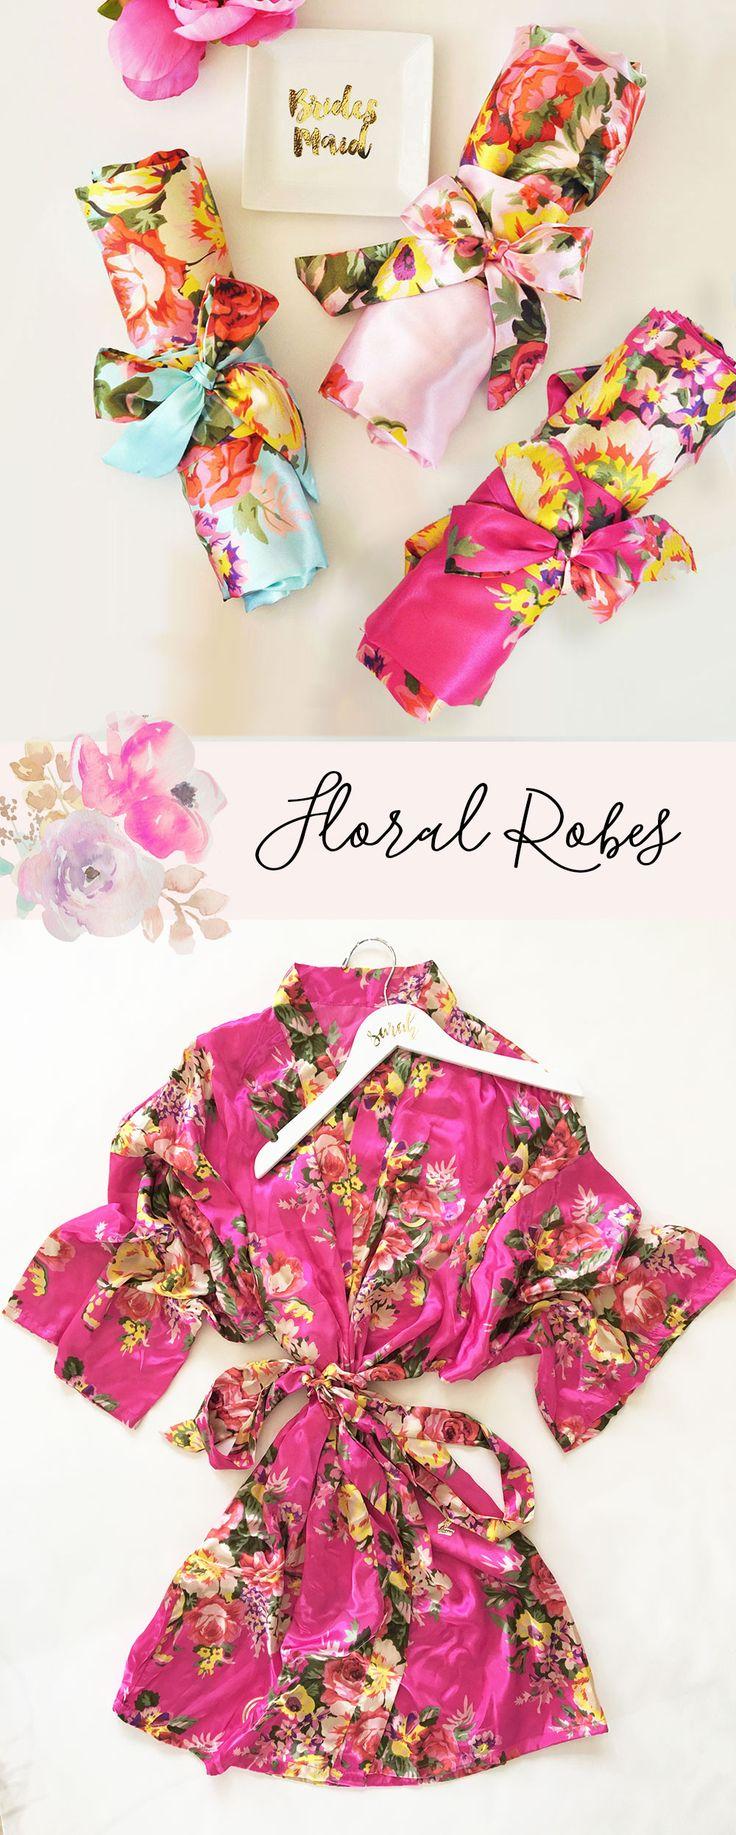 Floral Robe | Bridesmaid Gift Ideas | Floral Bridesmaid Robe | Floral Print